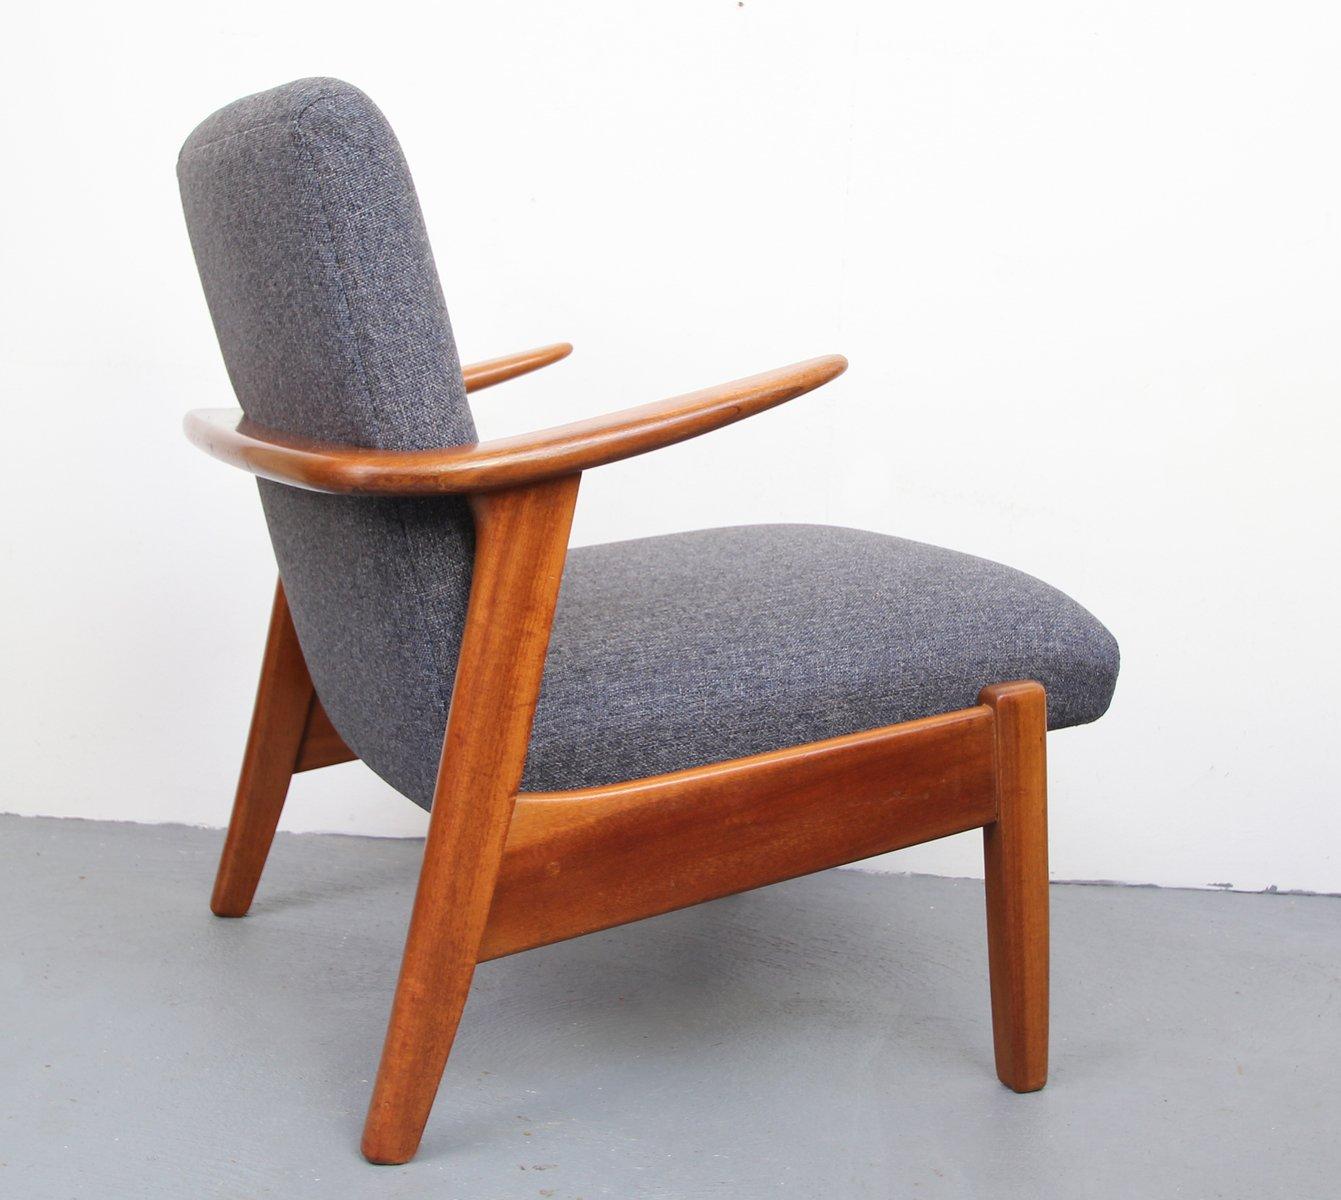 vintage teak sessel in blaugrau 1950er bei pamono kaufen. Black Bedroom Furniture Sets. Home Design Ideas